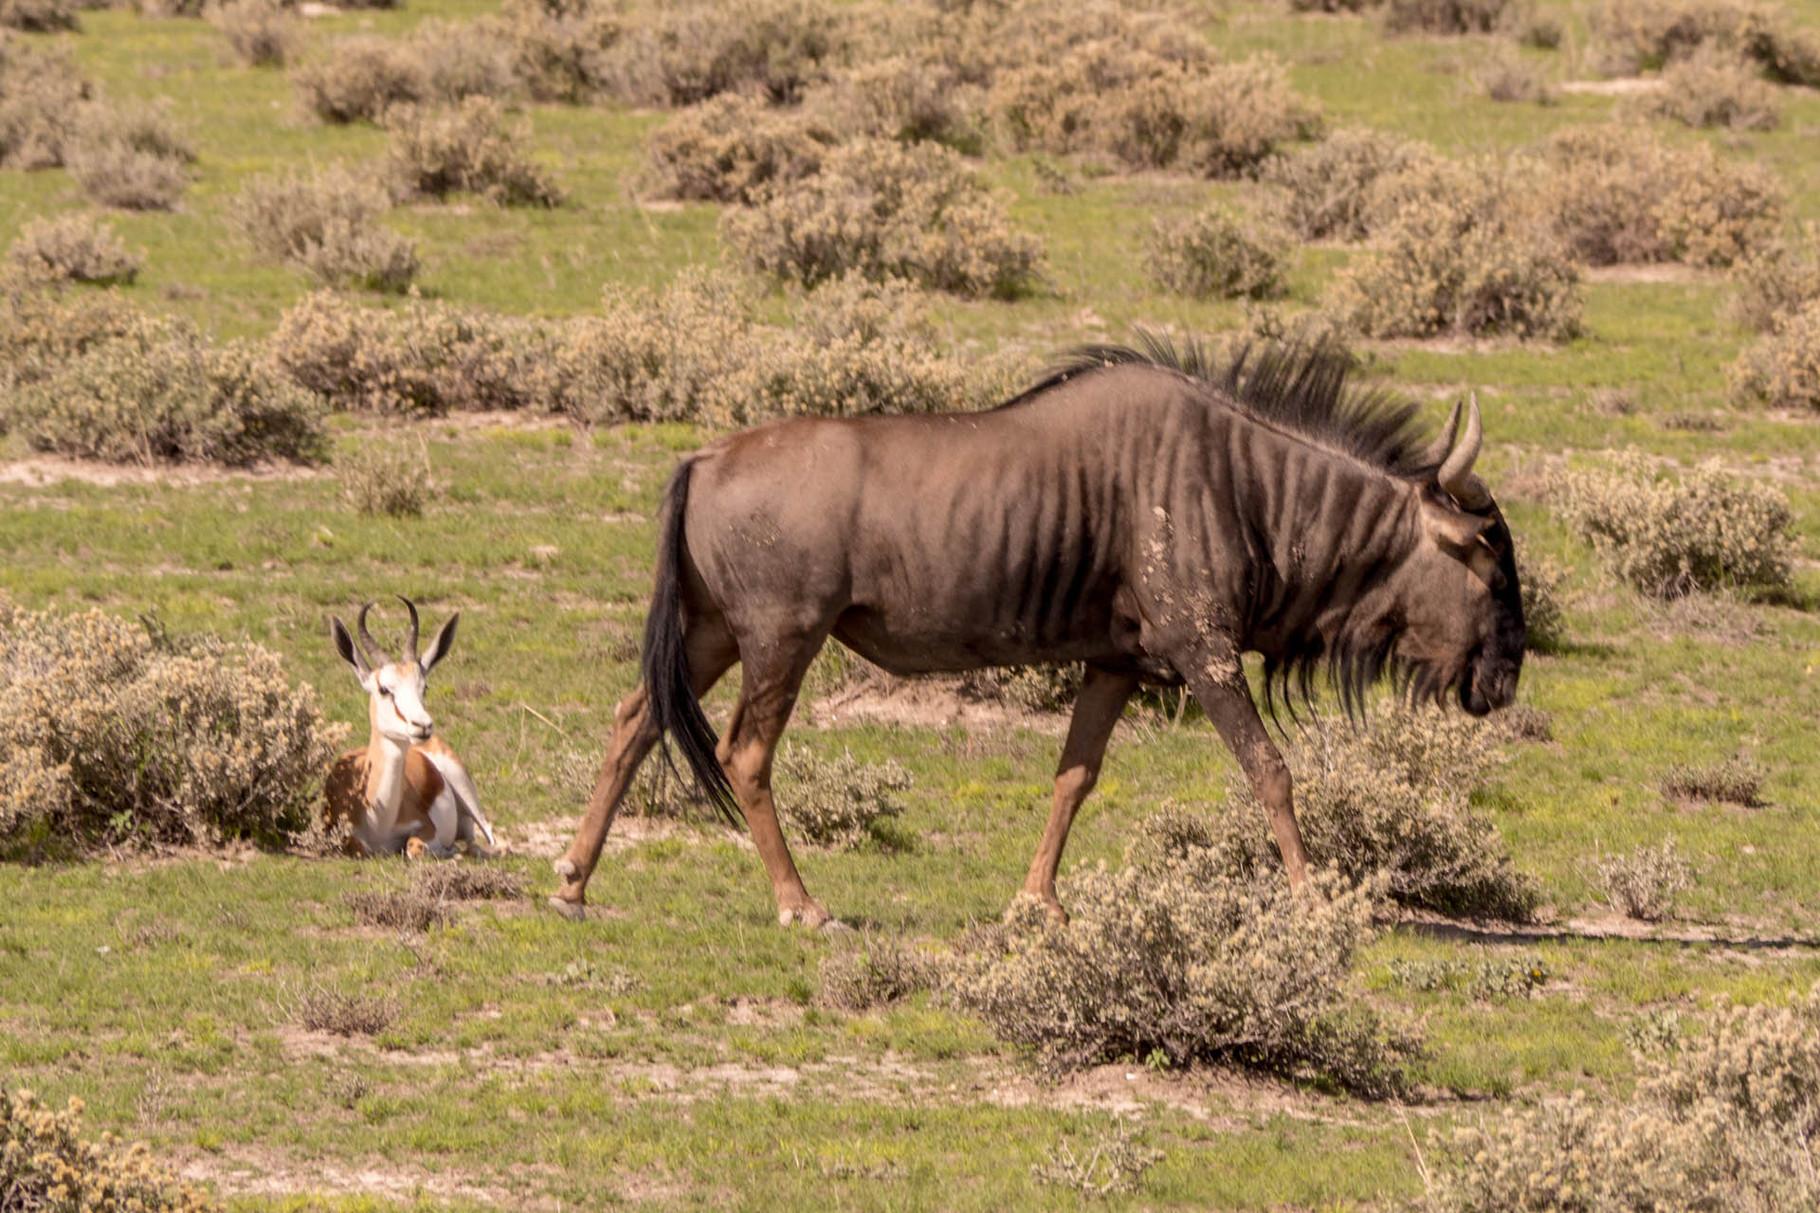 Wildebeest [Etosha Park, Namibia, 2015]